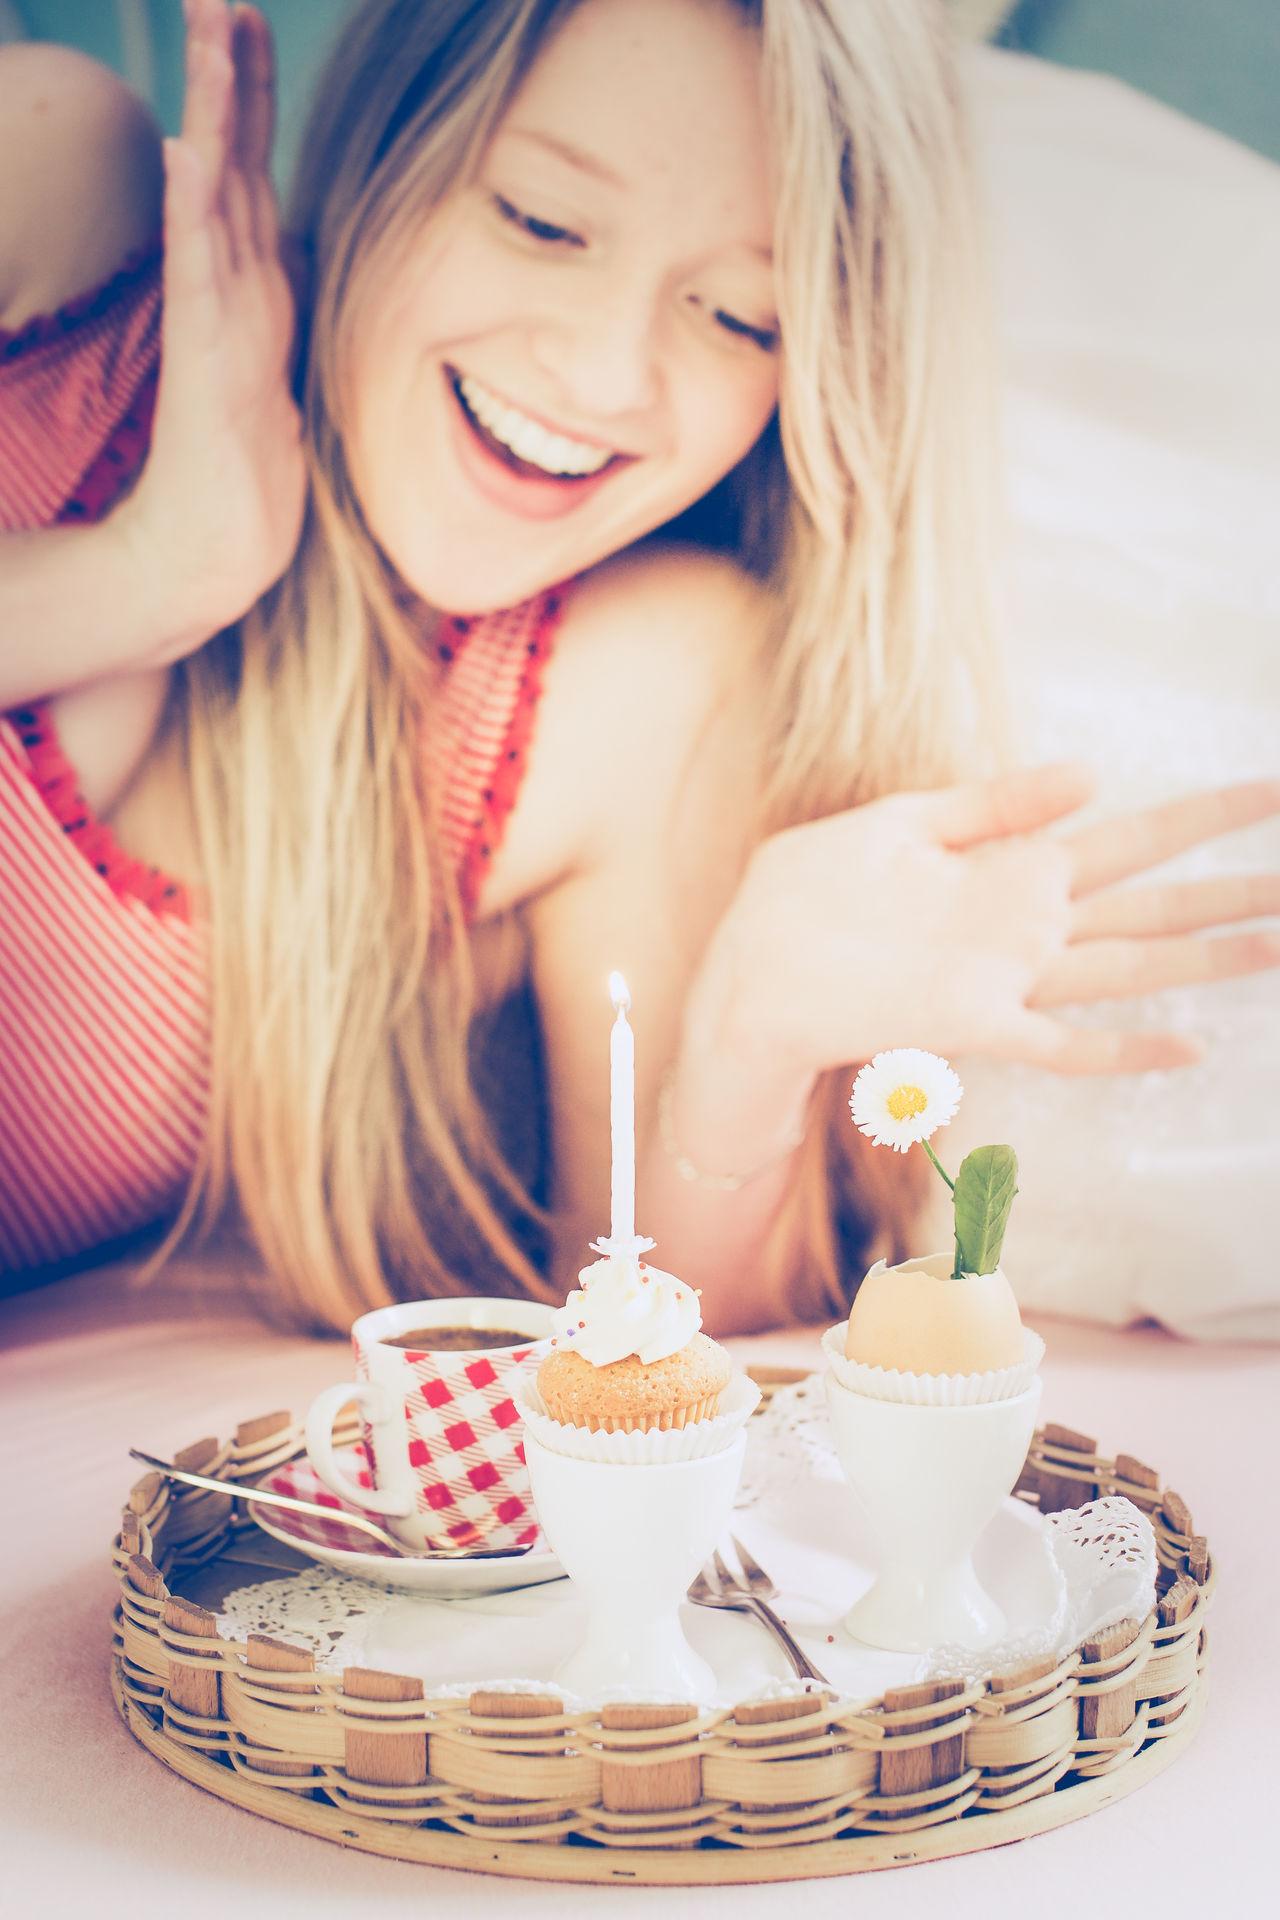 Beautiful stock photos of geburtstagskuchen,  16-17 Years,  Adults Only,  Beautiful Woman,  Birthday